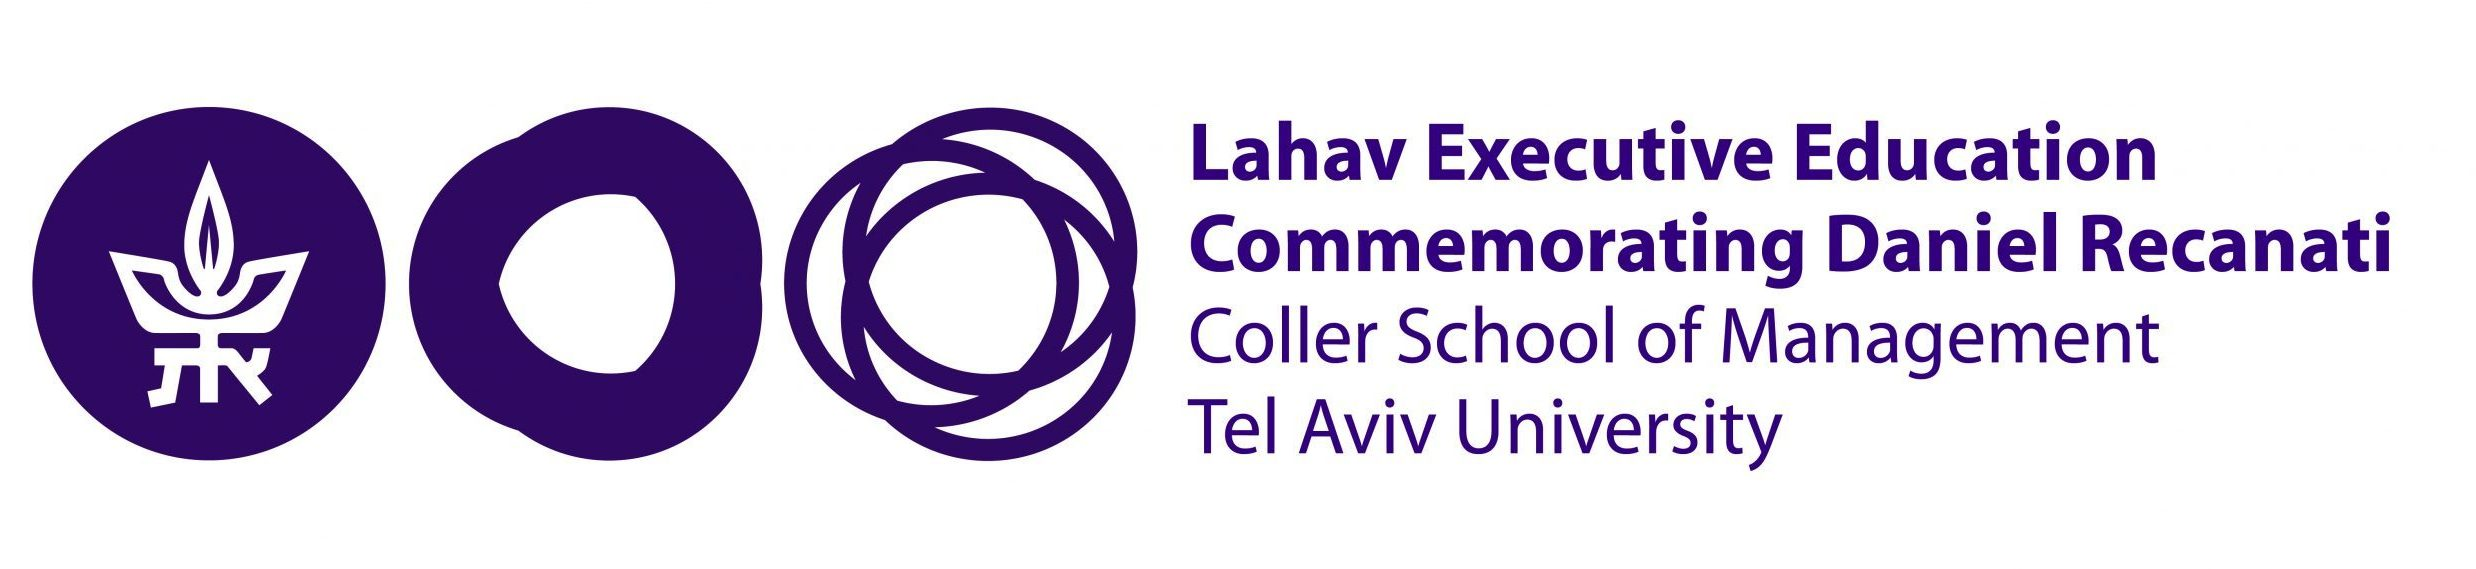 LahaV Executive Education